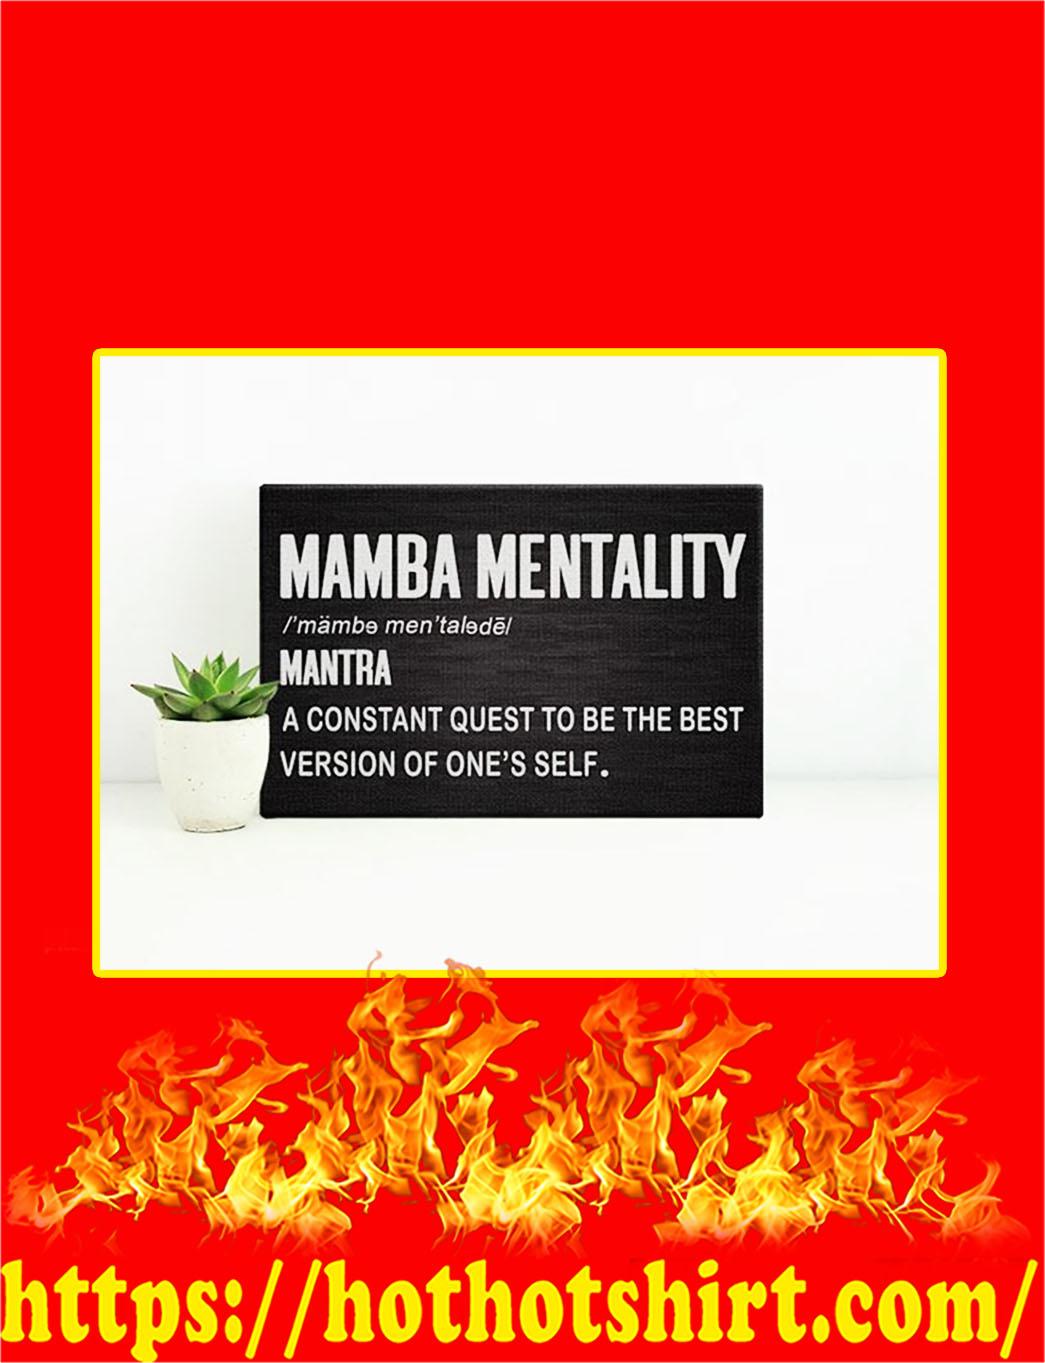 Mamba Mentality Canvas Prints - Large